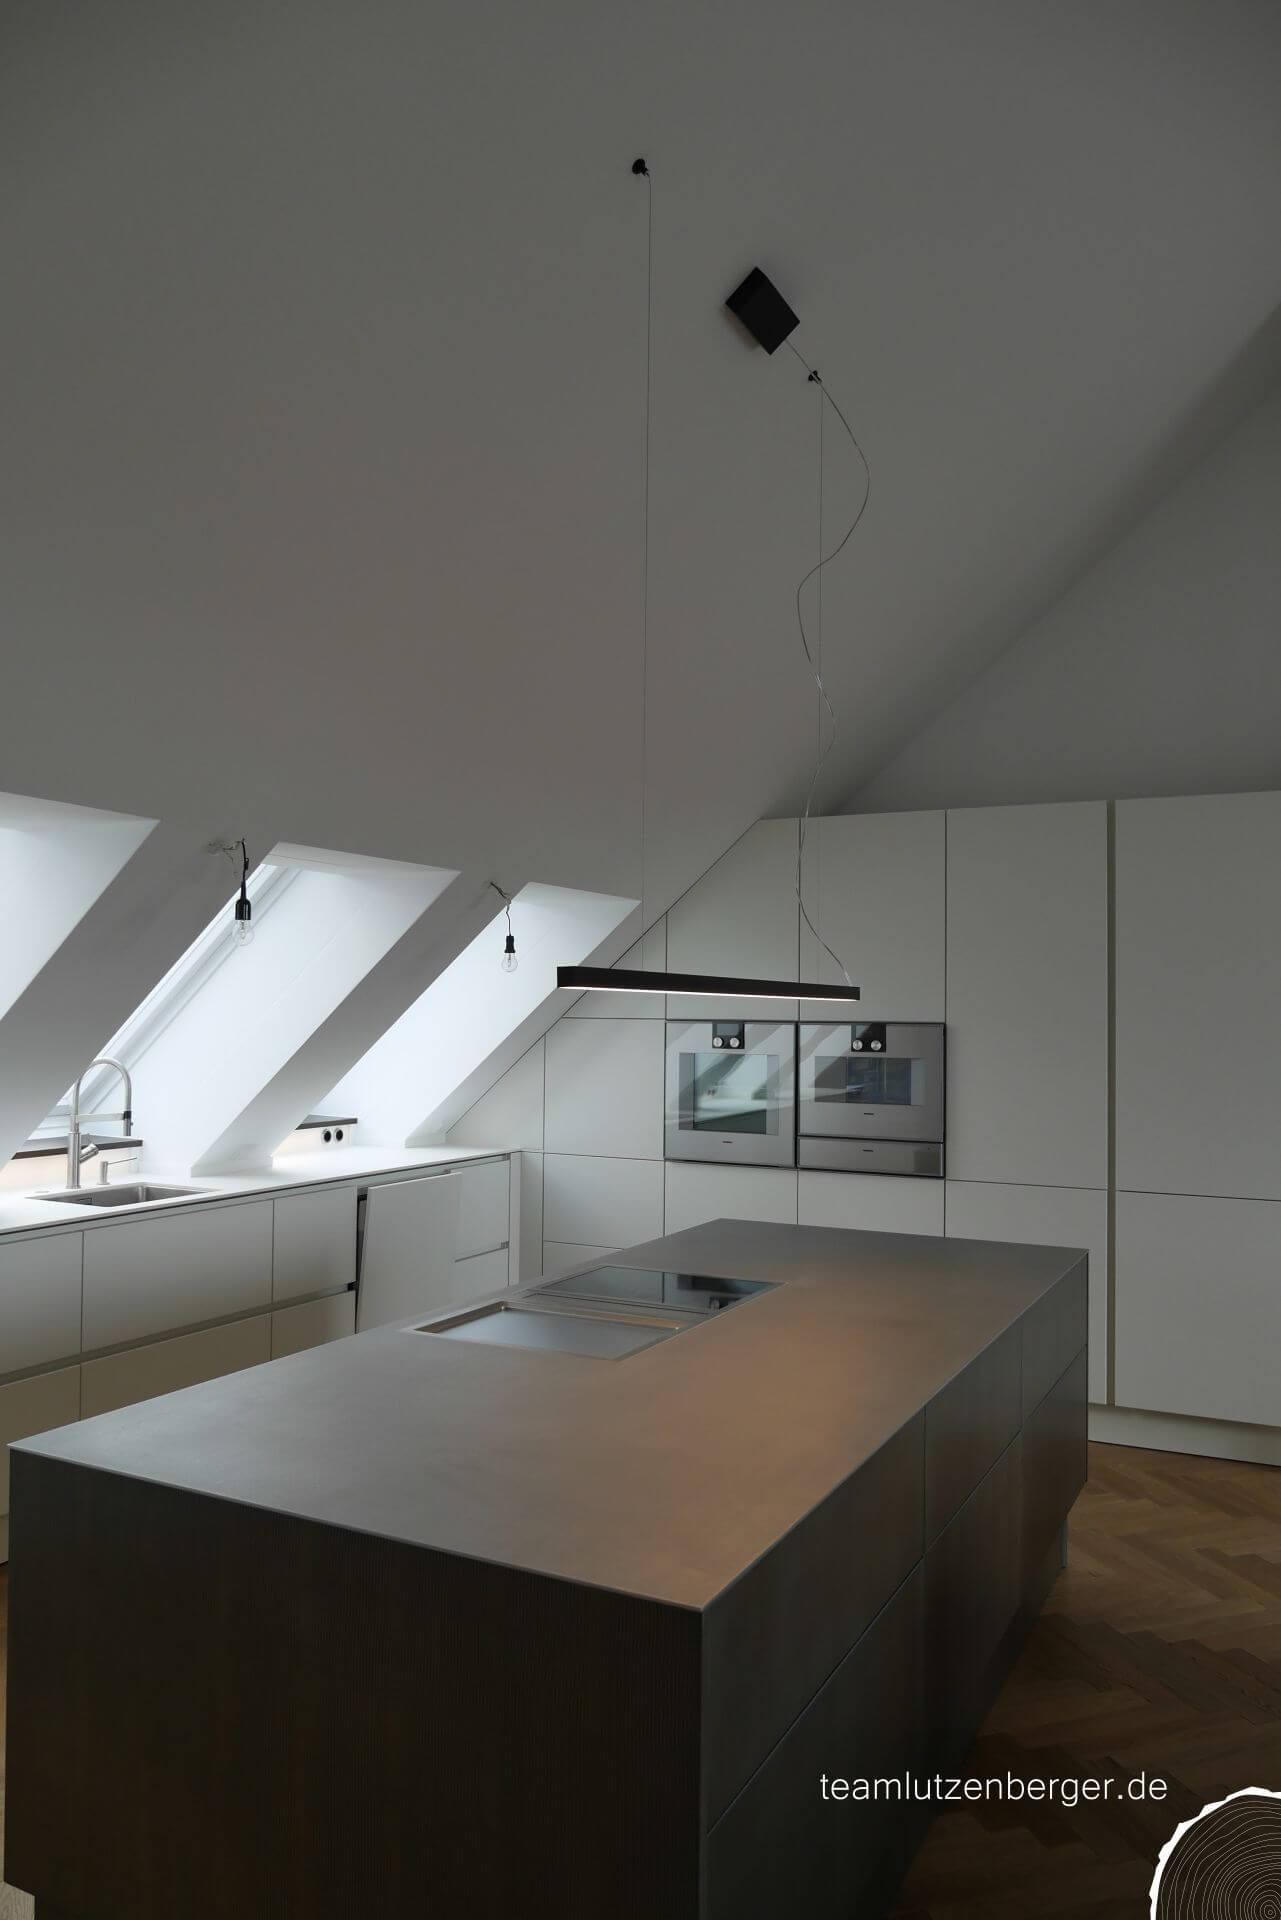 Küche Penthouse München - Teamlutzenberger